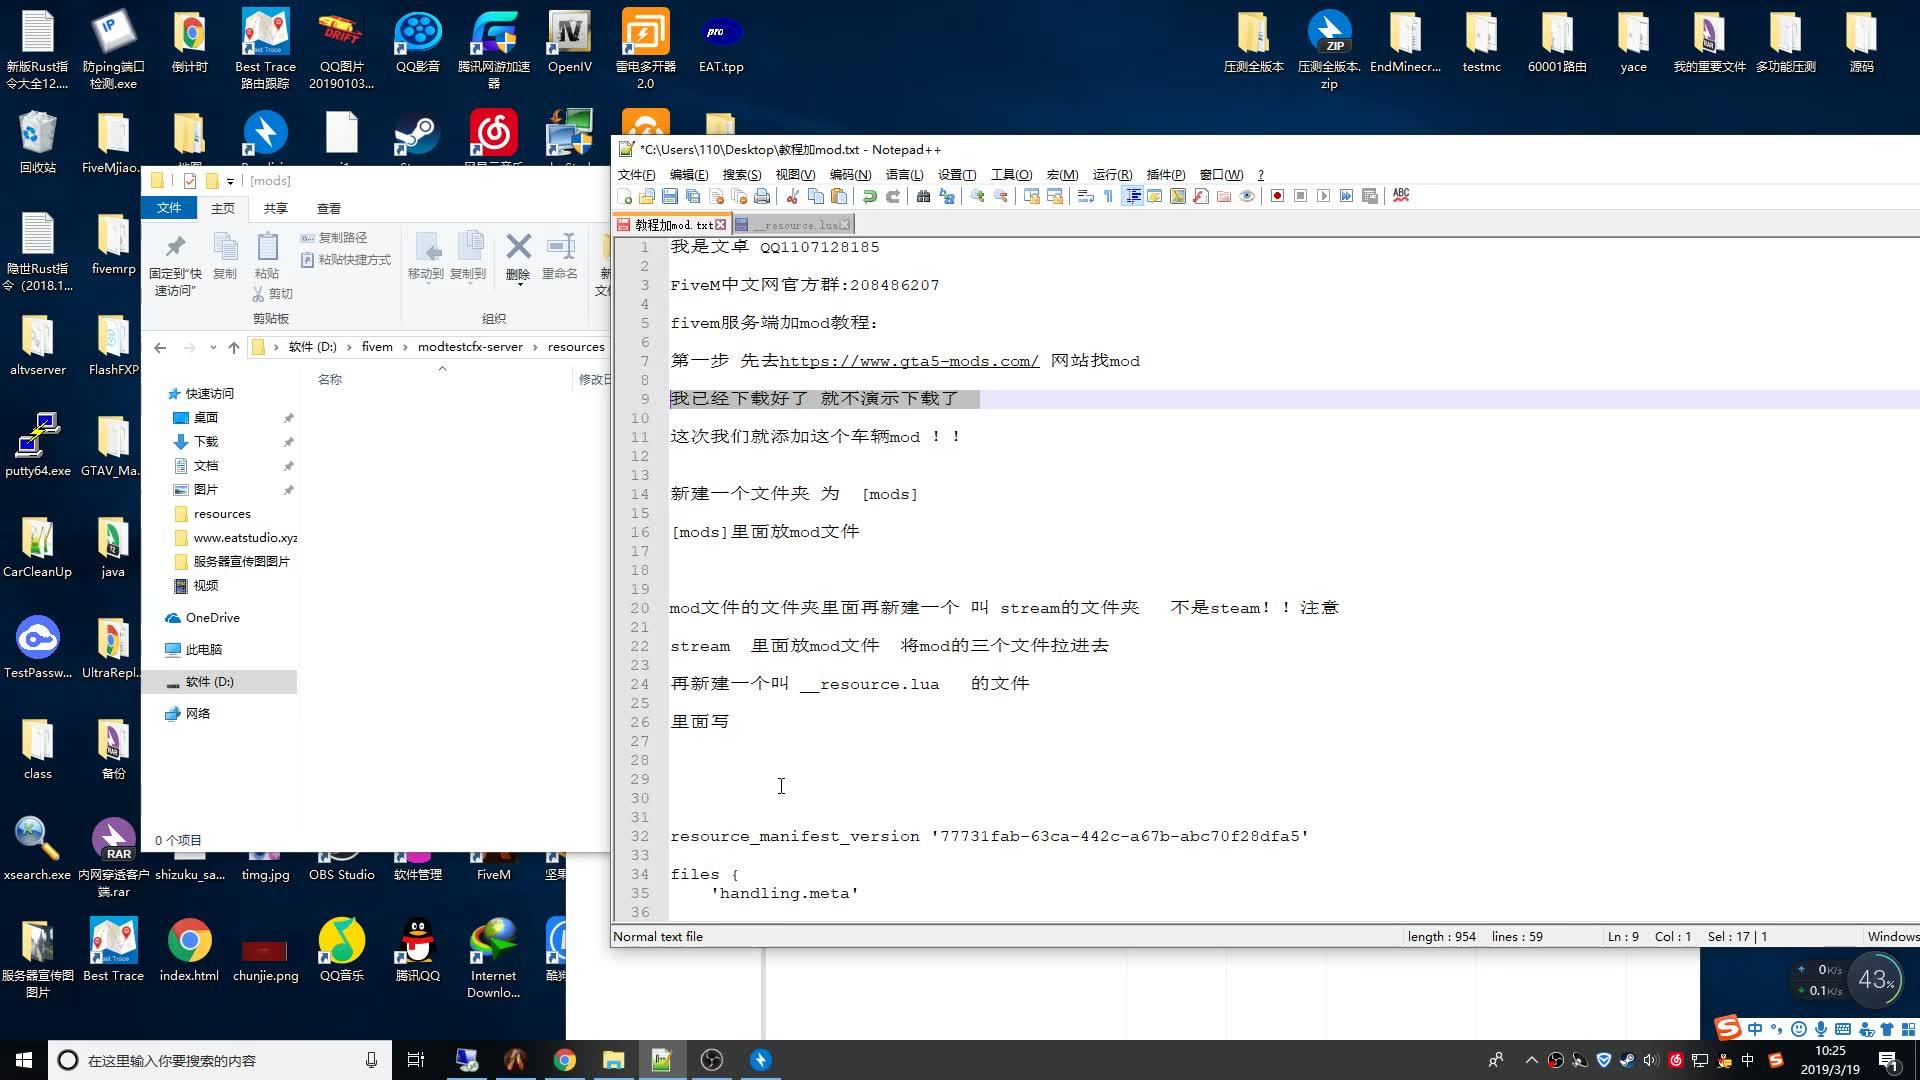 GTA5 FiveM 服务器简单得添加MOD教程_哔哩哔哩 (゜-゜)つロ 干杯~-bilibili